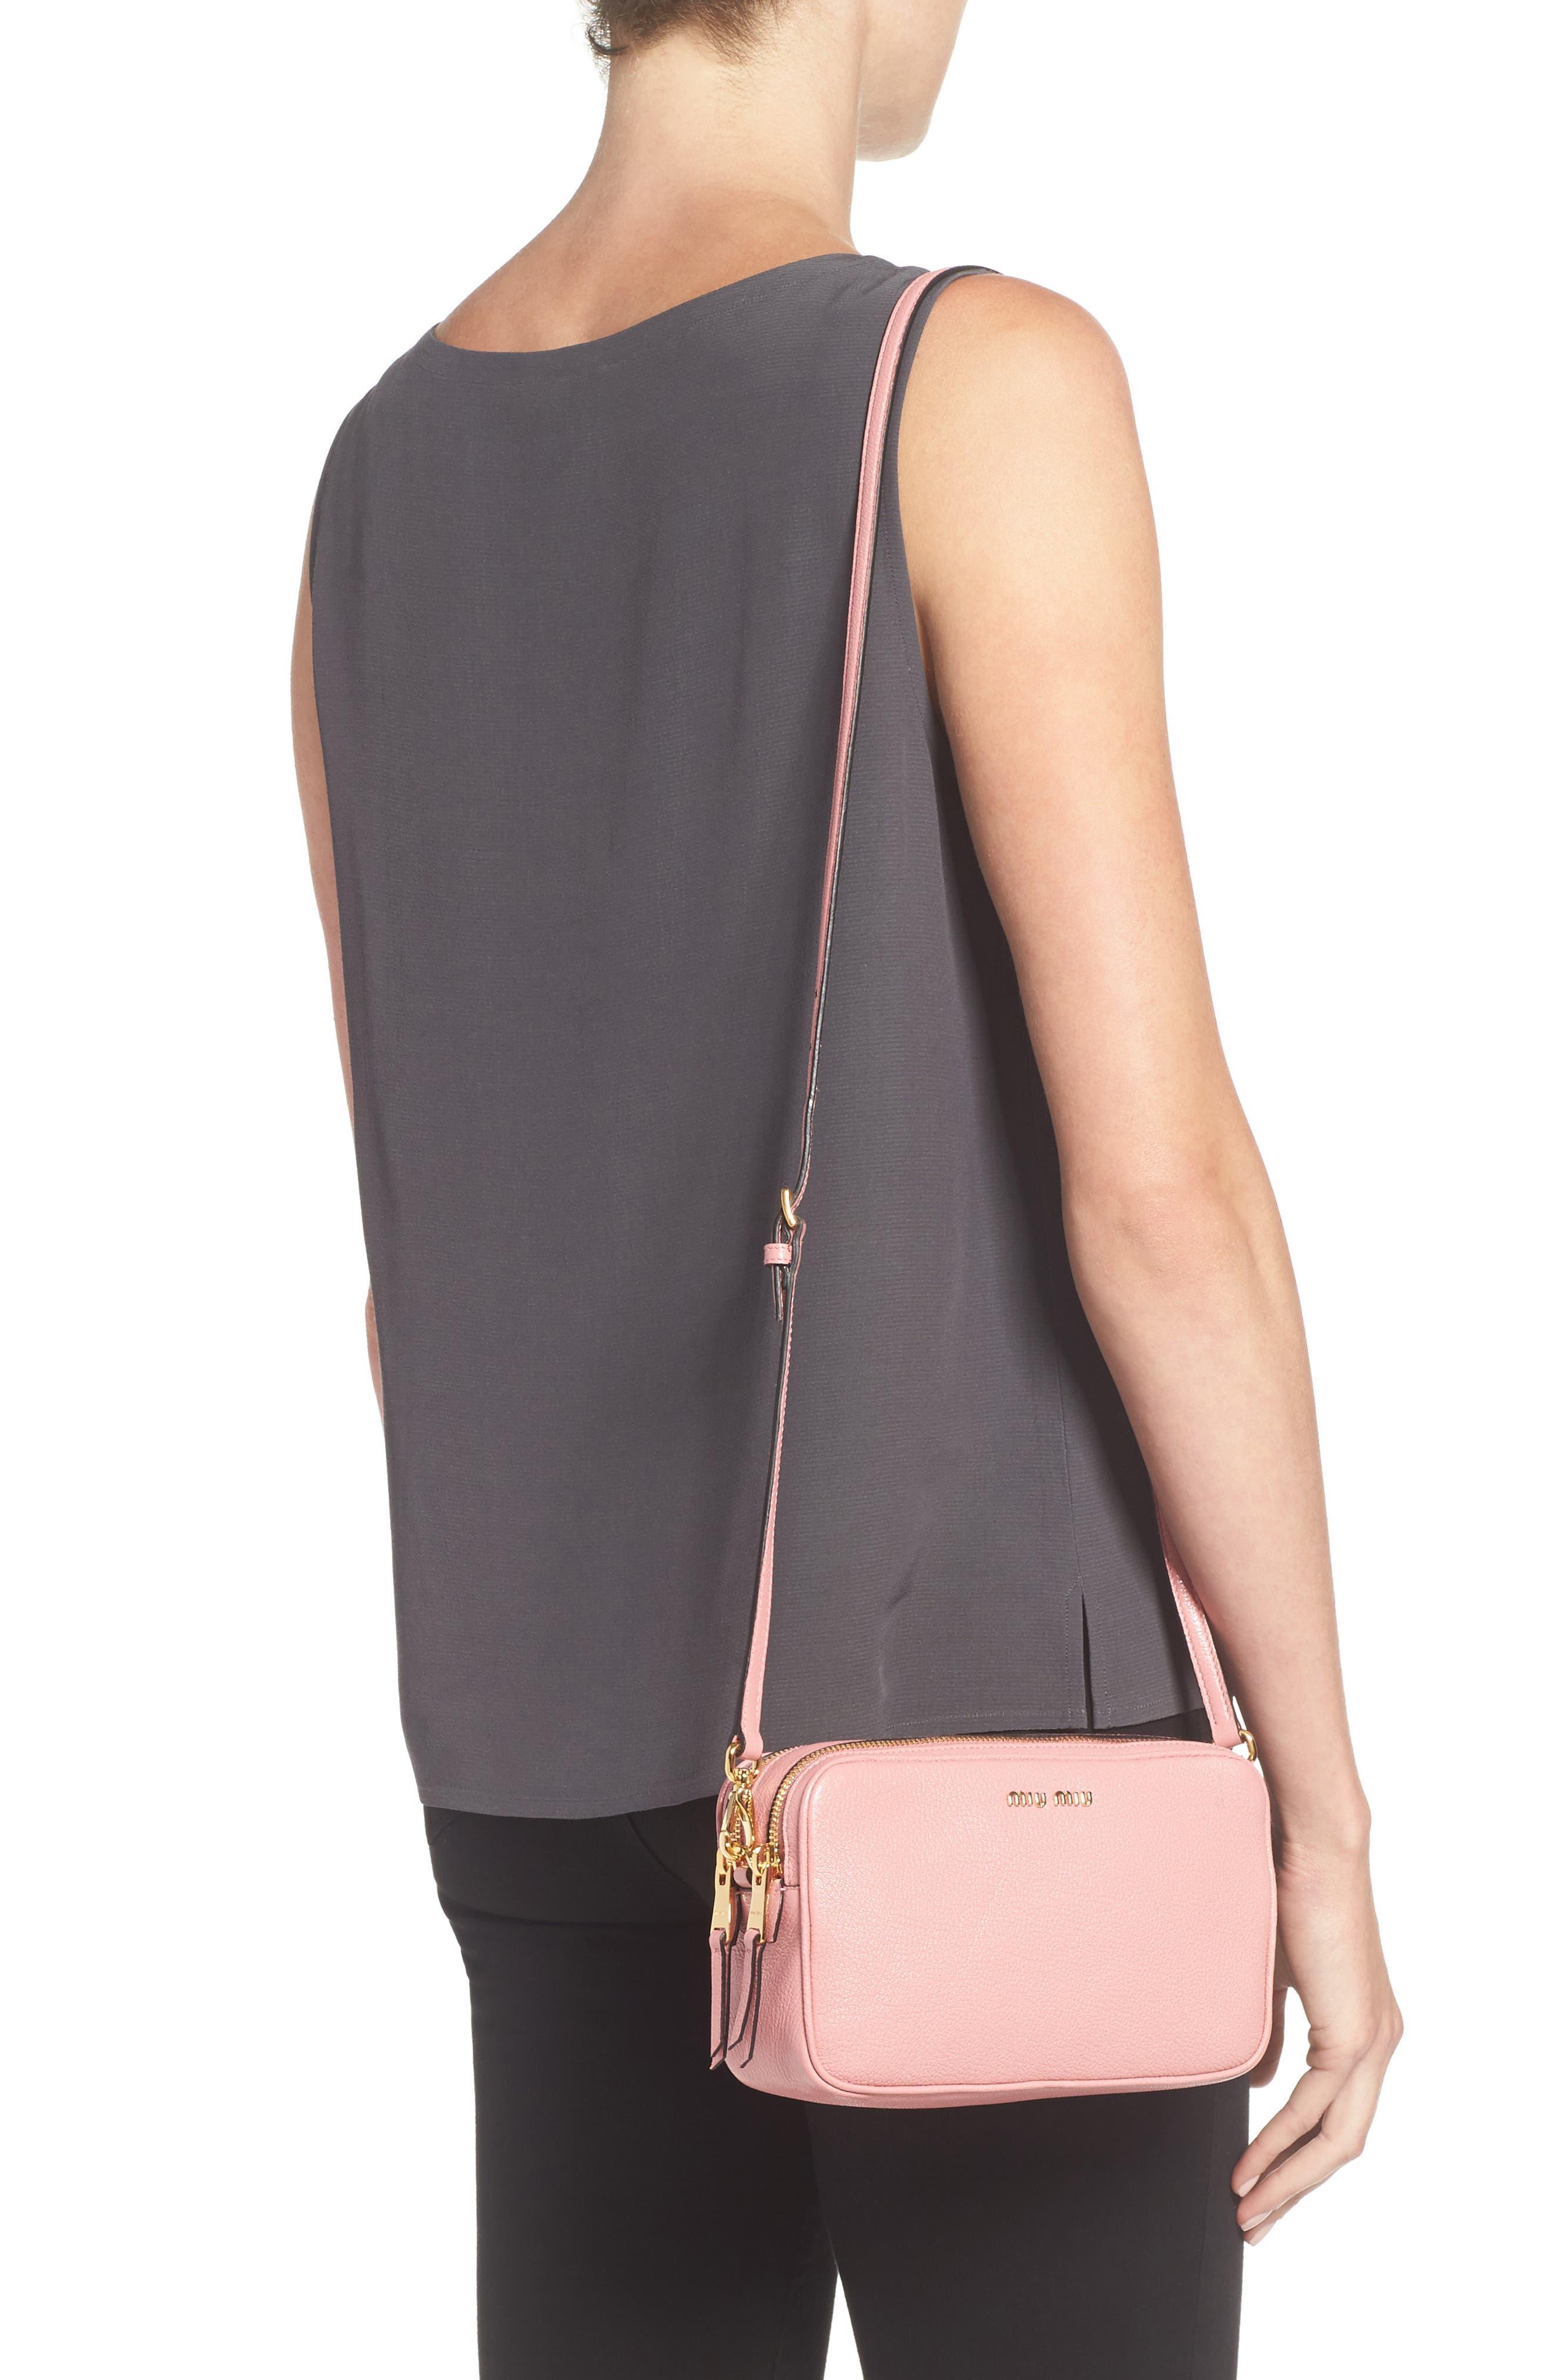 Madras Goatskin Leather Crossbody Bag,                             Alternate thumbnail 2, color,